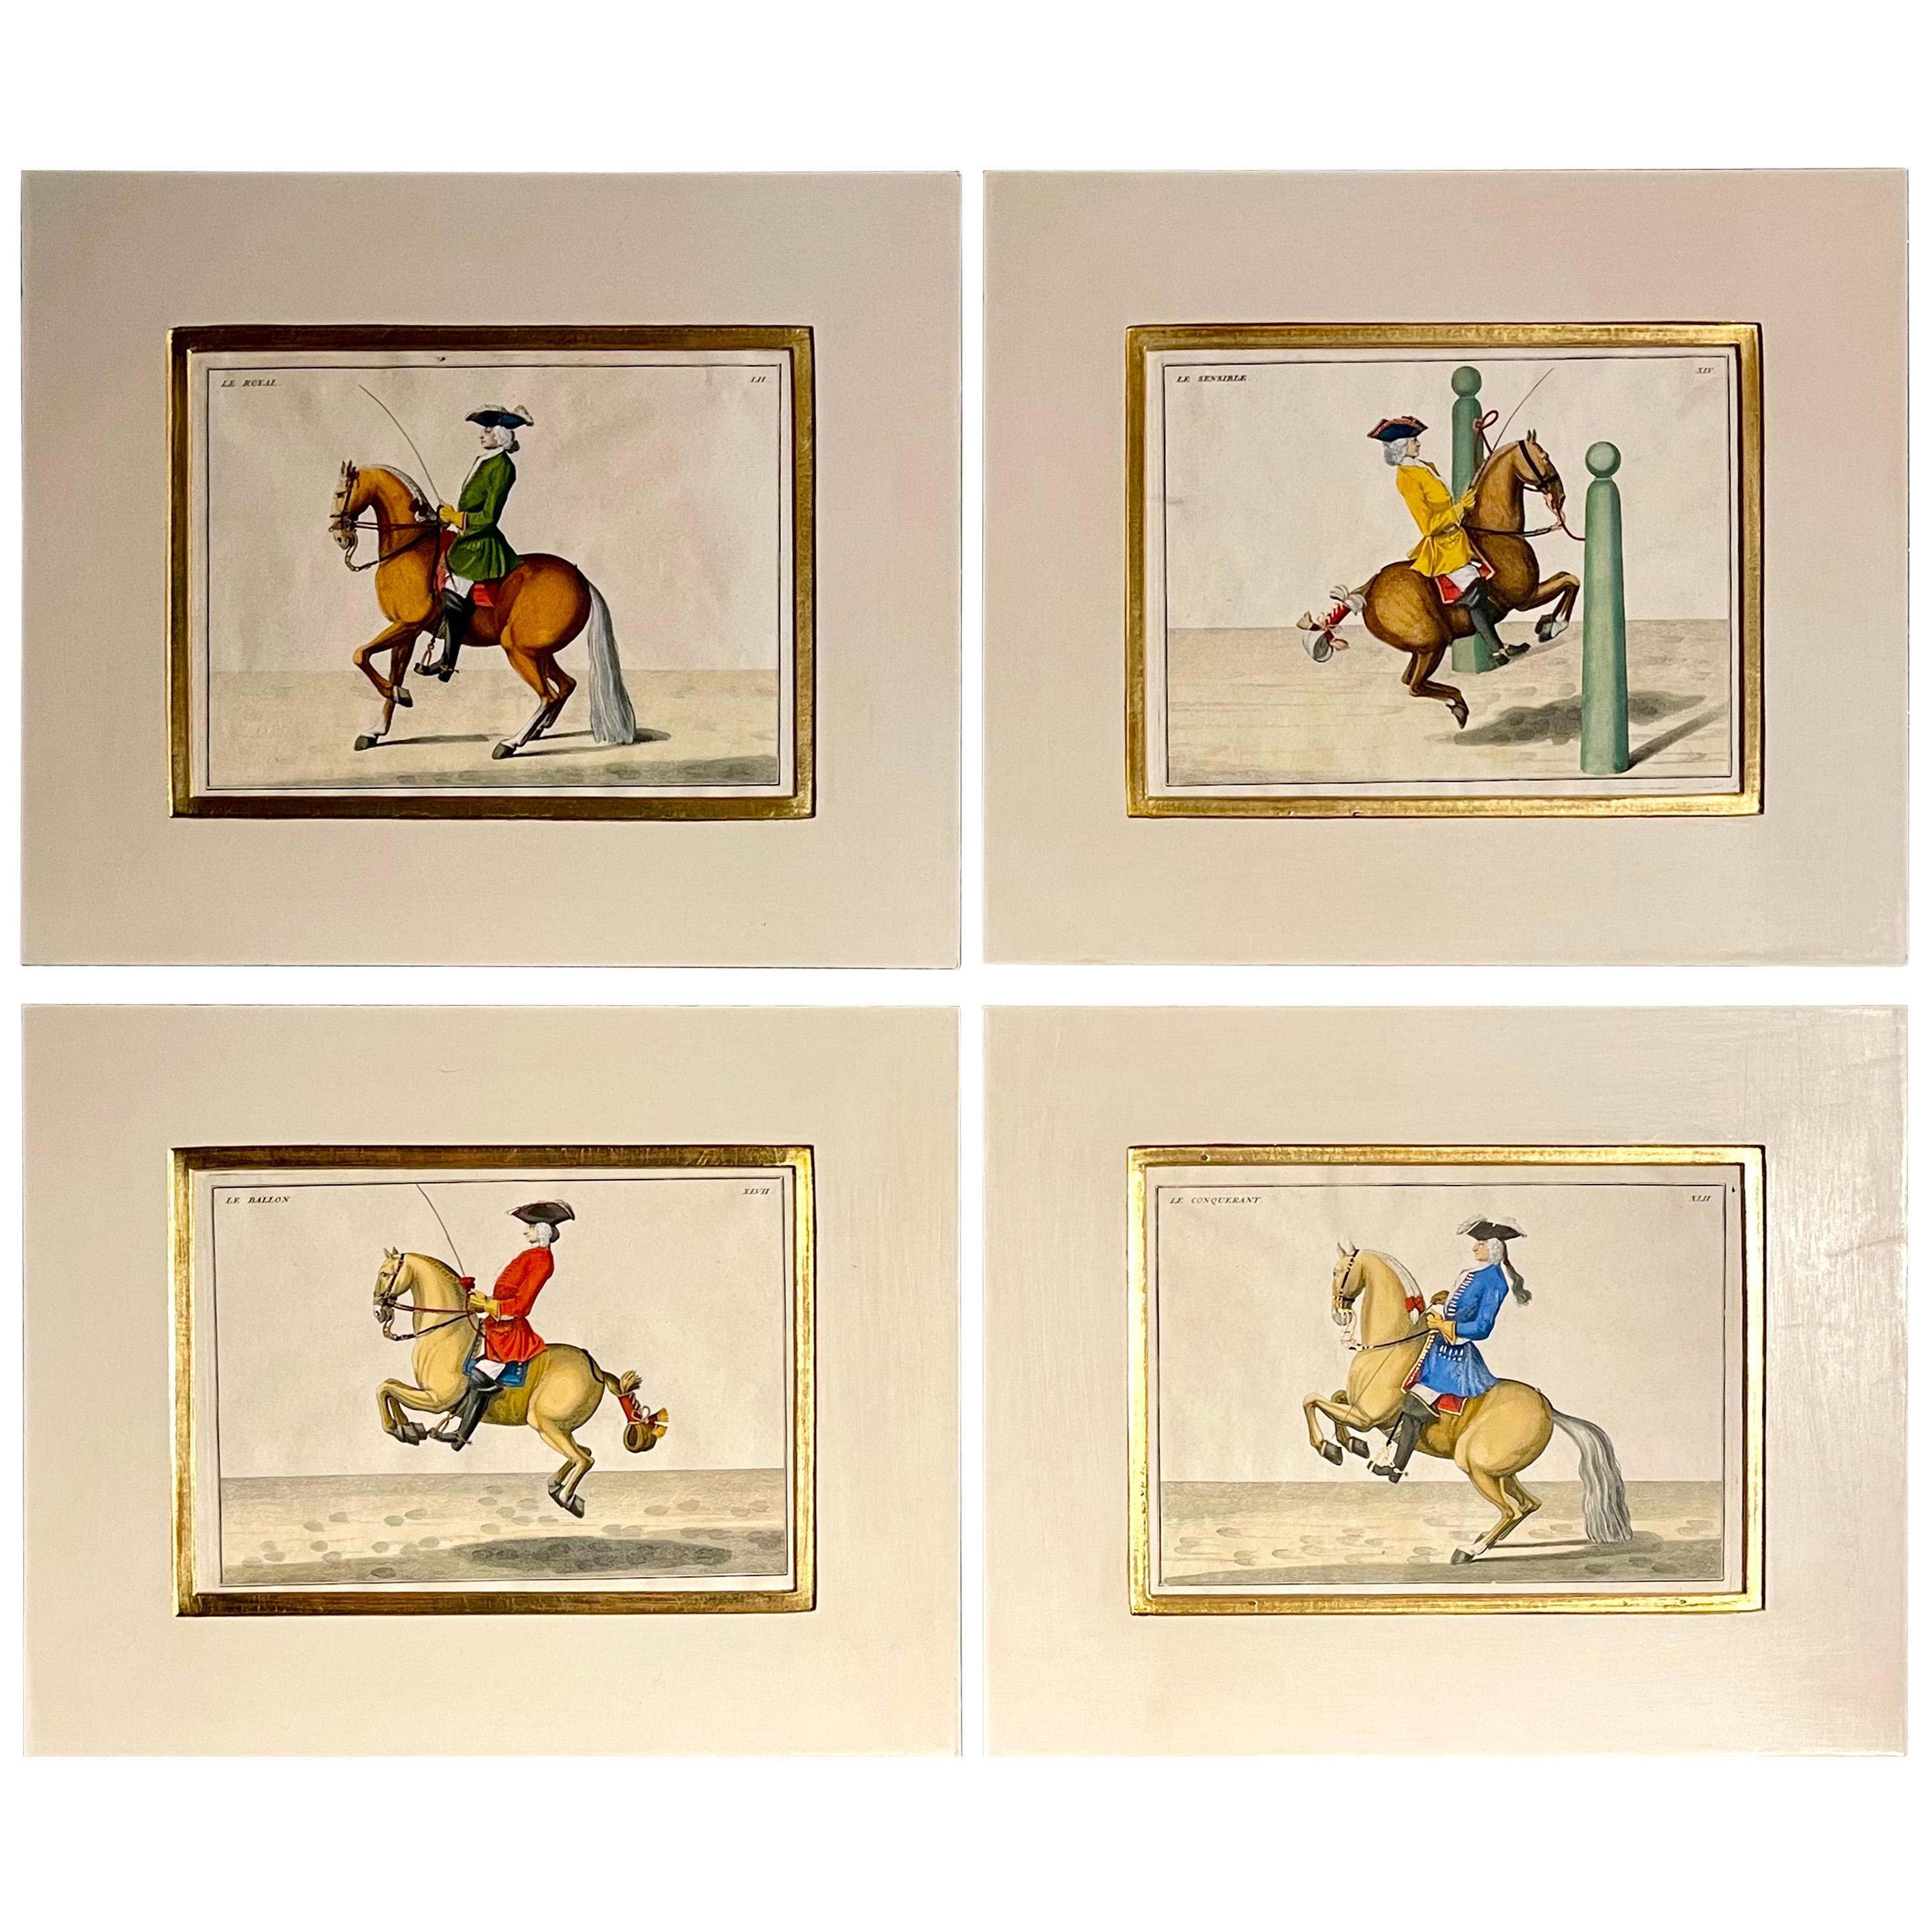 Four Engravings of Horse Riders Le Sensible, Le Royal, Le Conquerant, Le Ballon